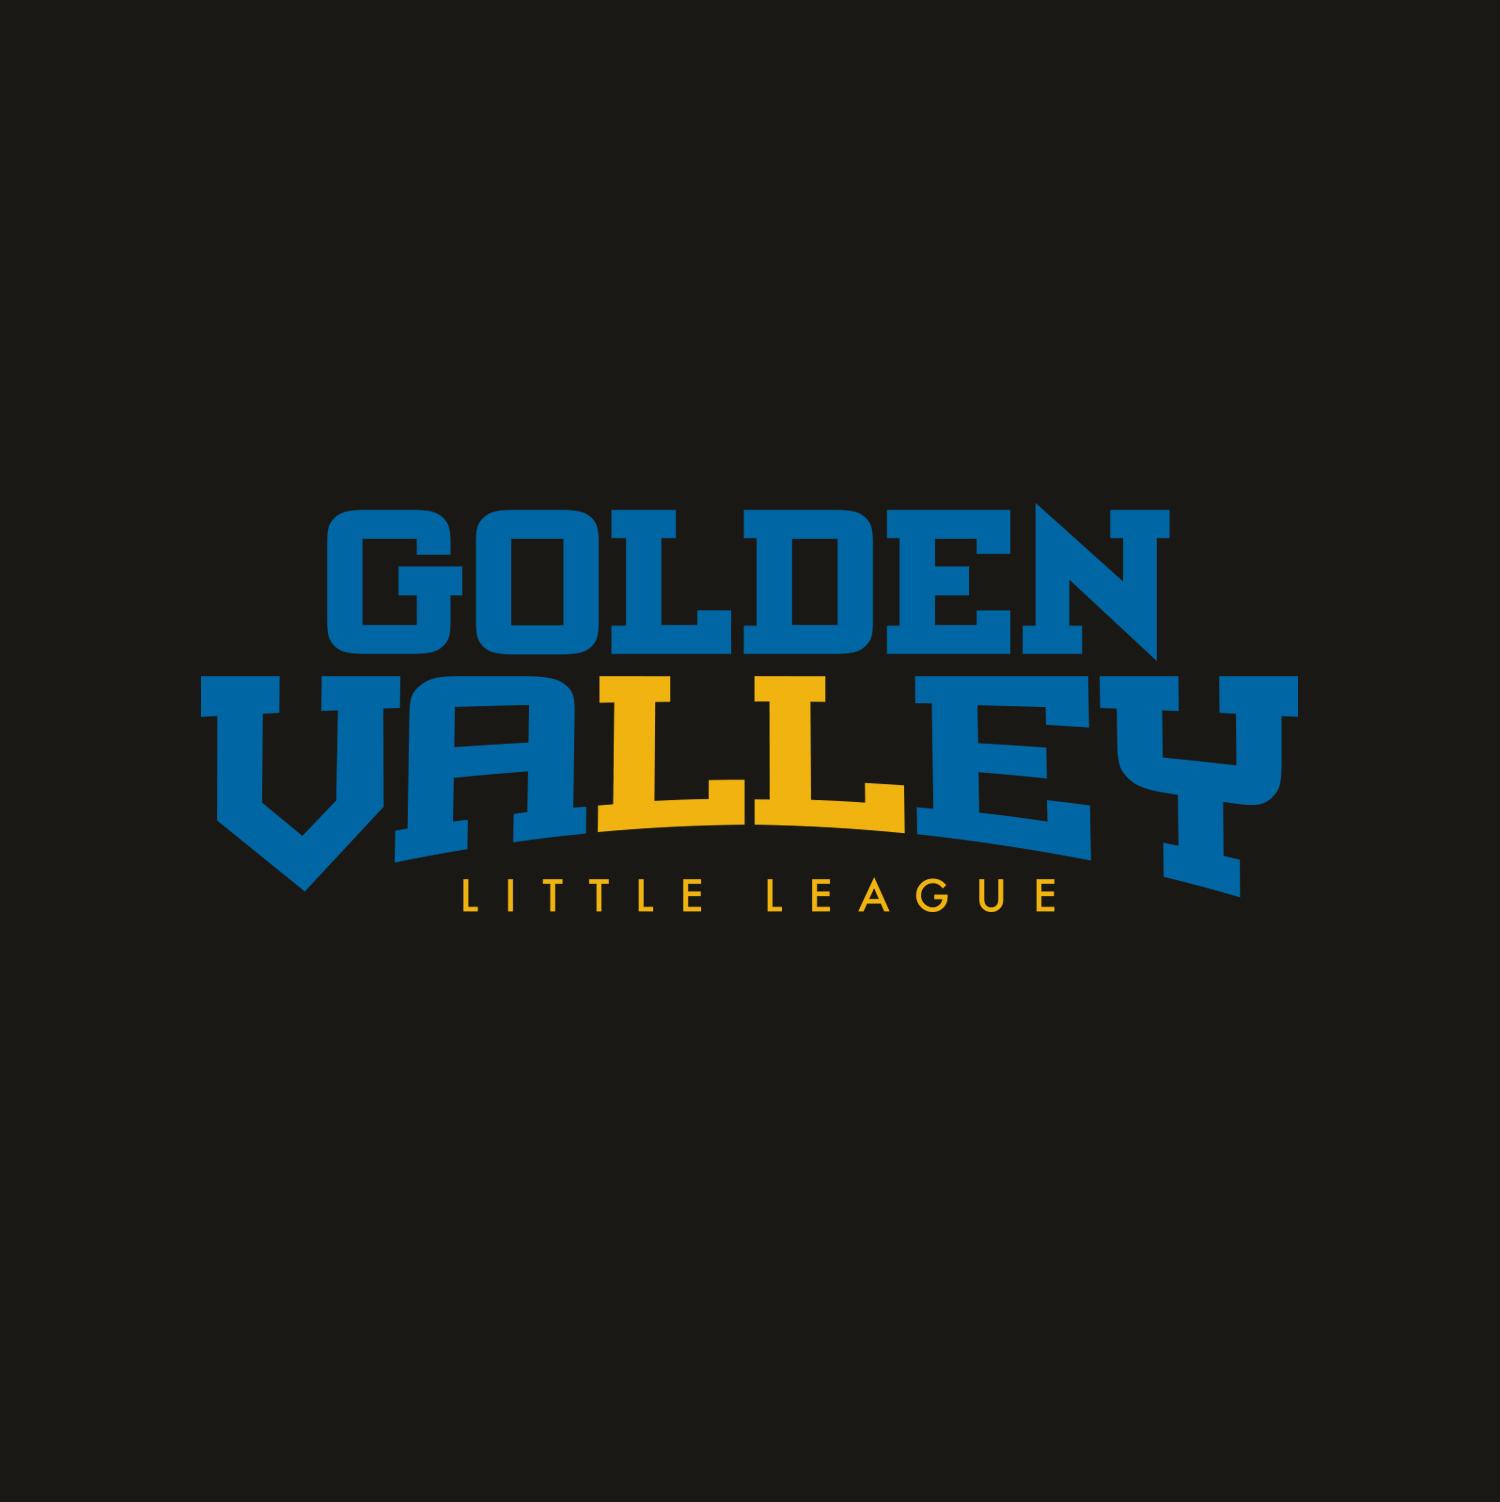 Golden Valley.jpg